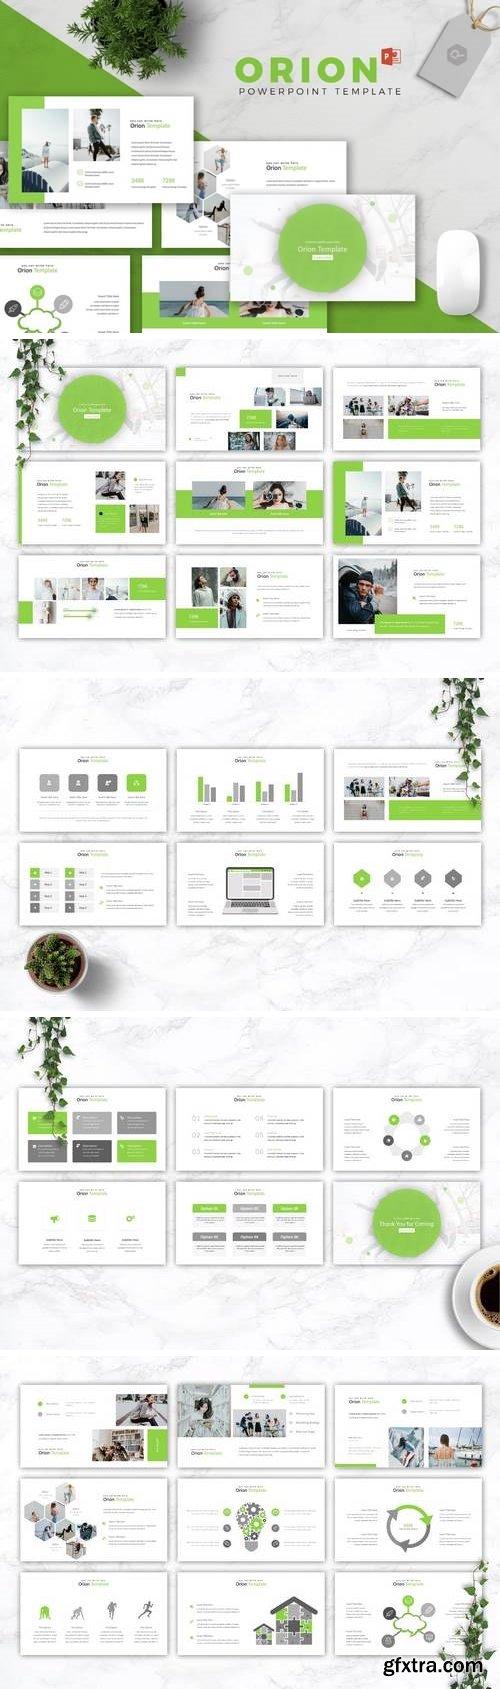 Orion - Powerpoint, Keynote, Google Sliders Templates